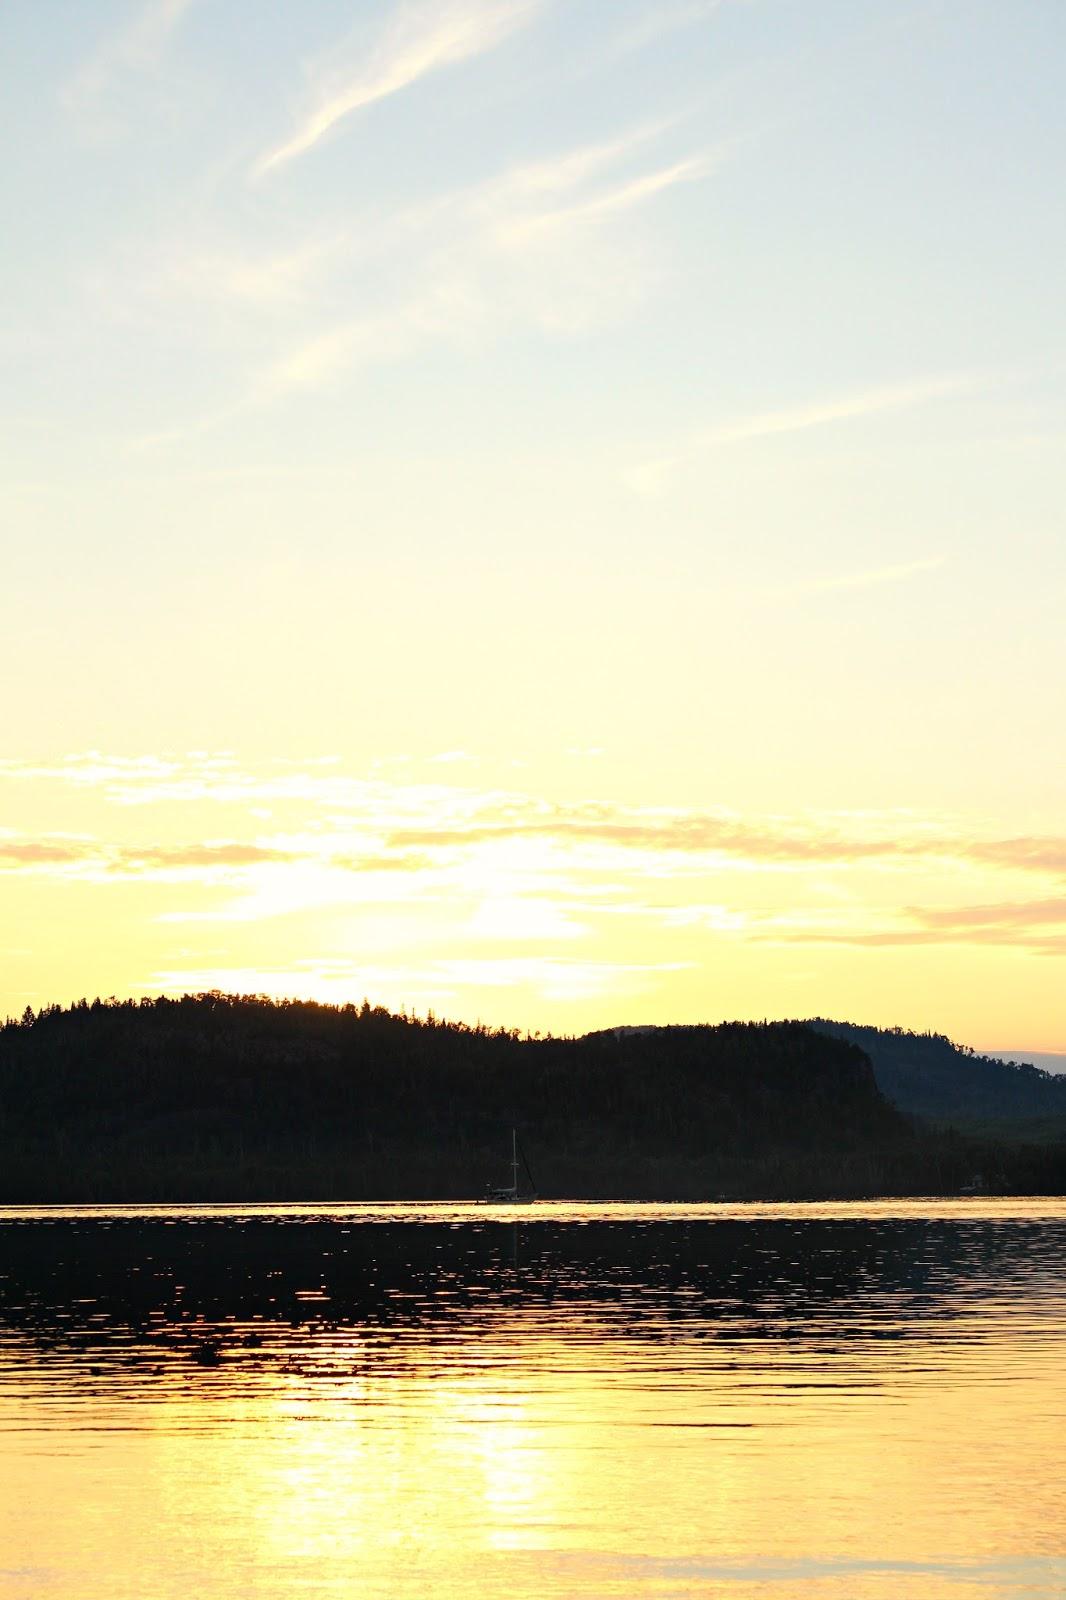 Lake Sunset with Sailboat